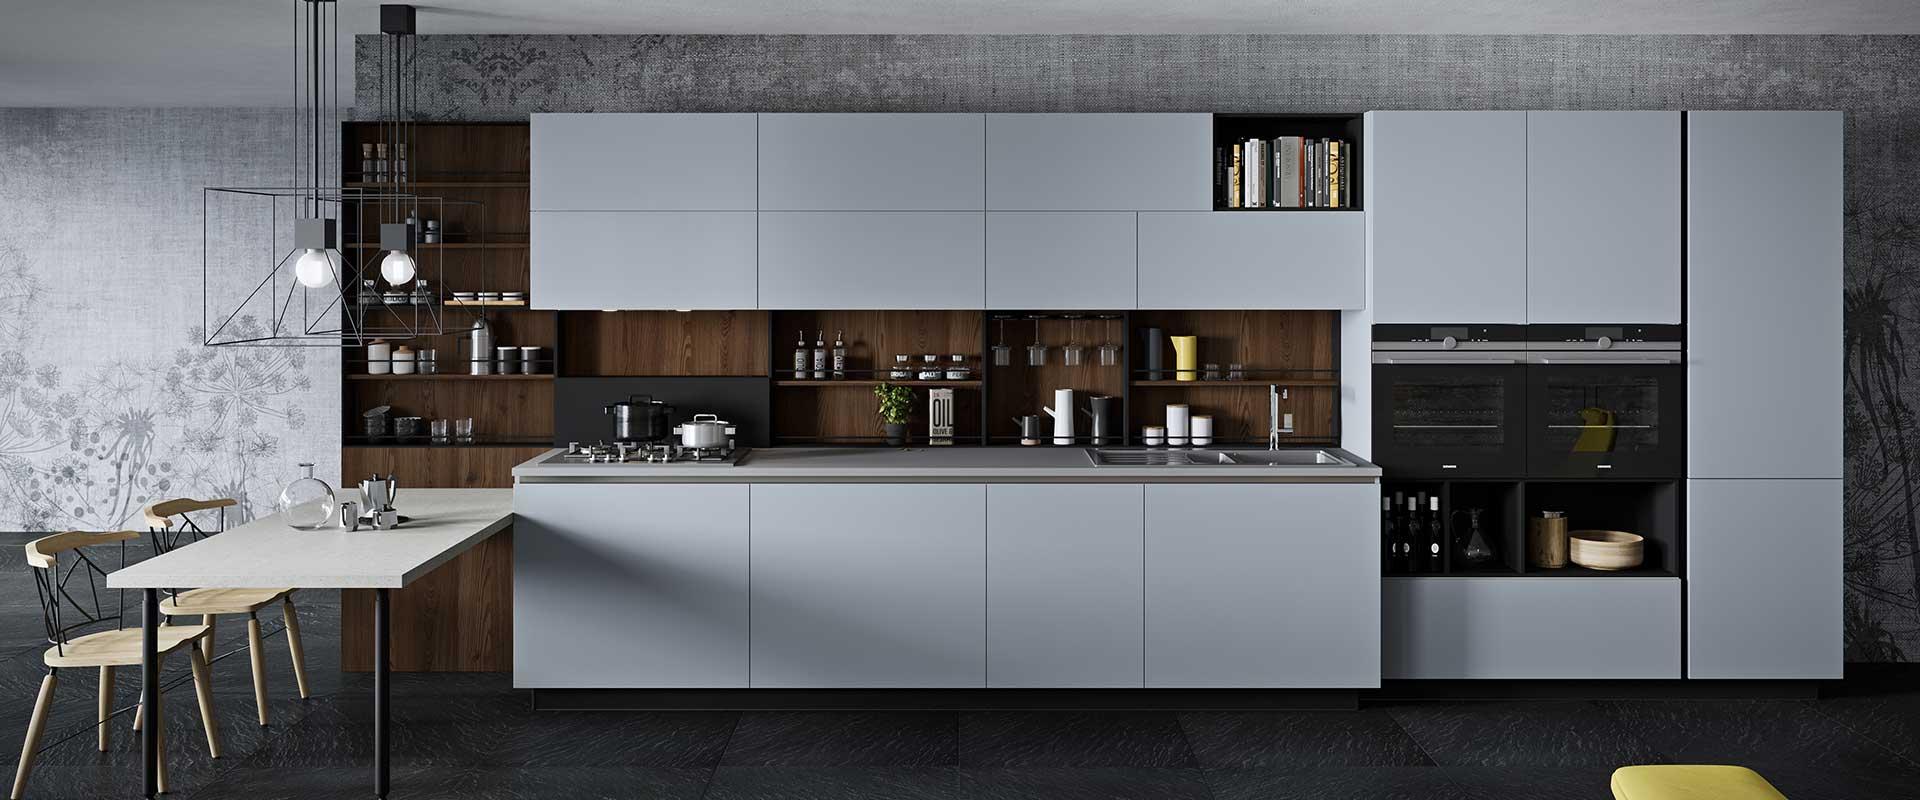 Cucine Aran Moderne